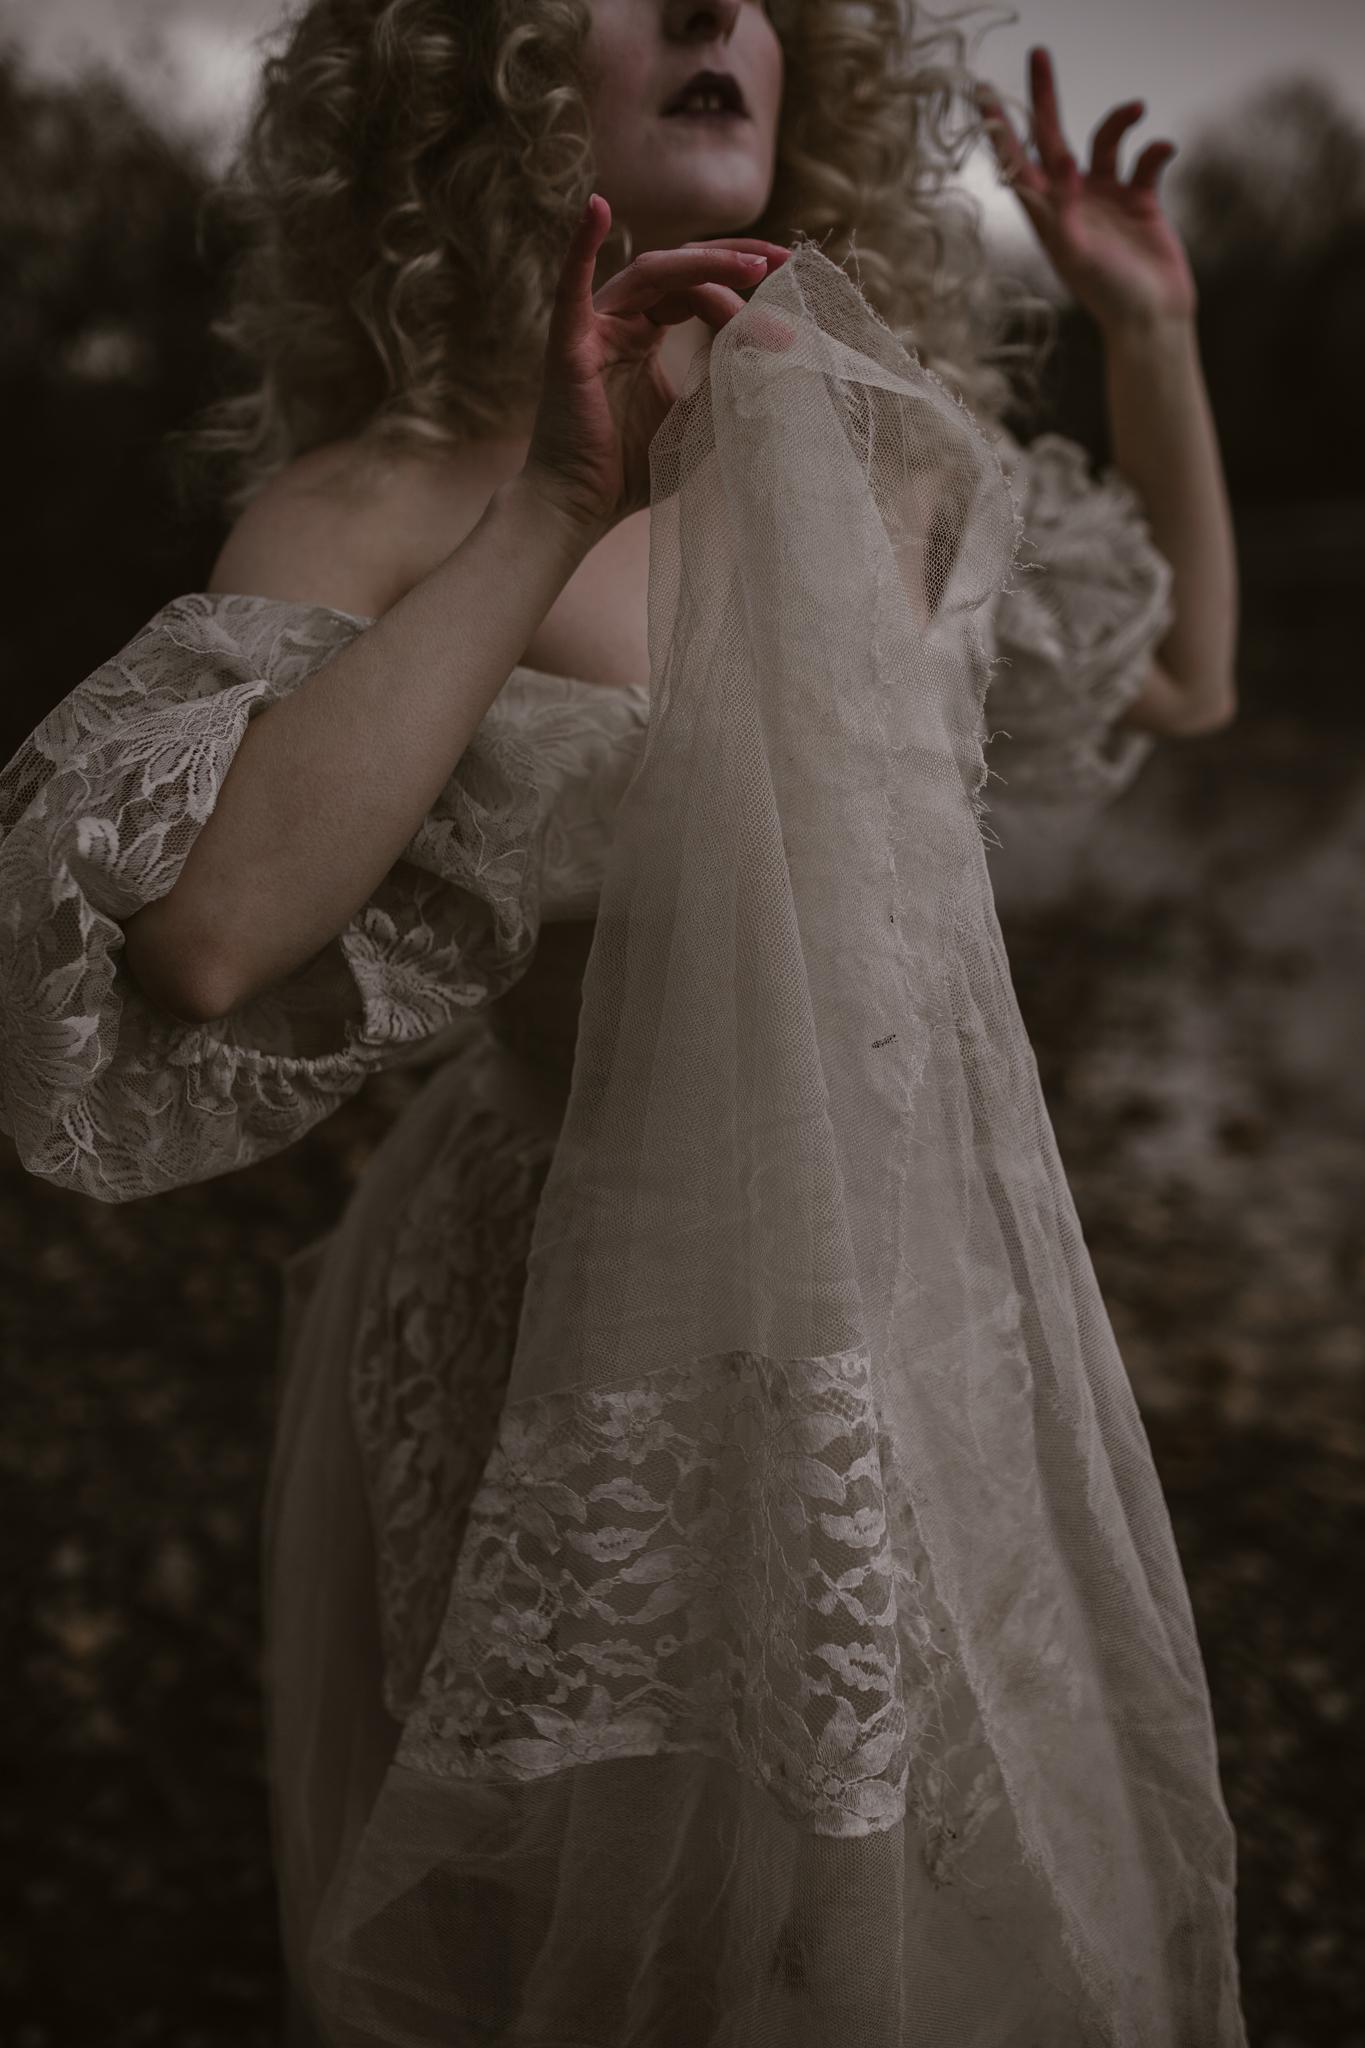 pale-witch-254fb.jpg